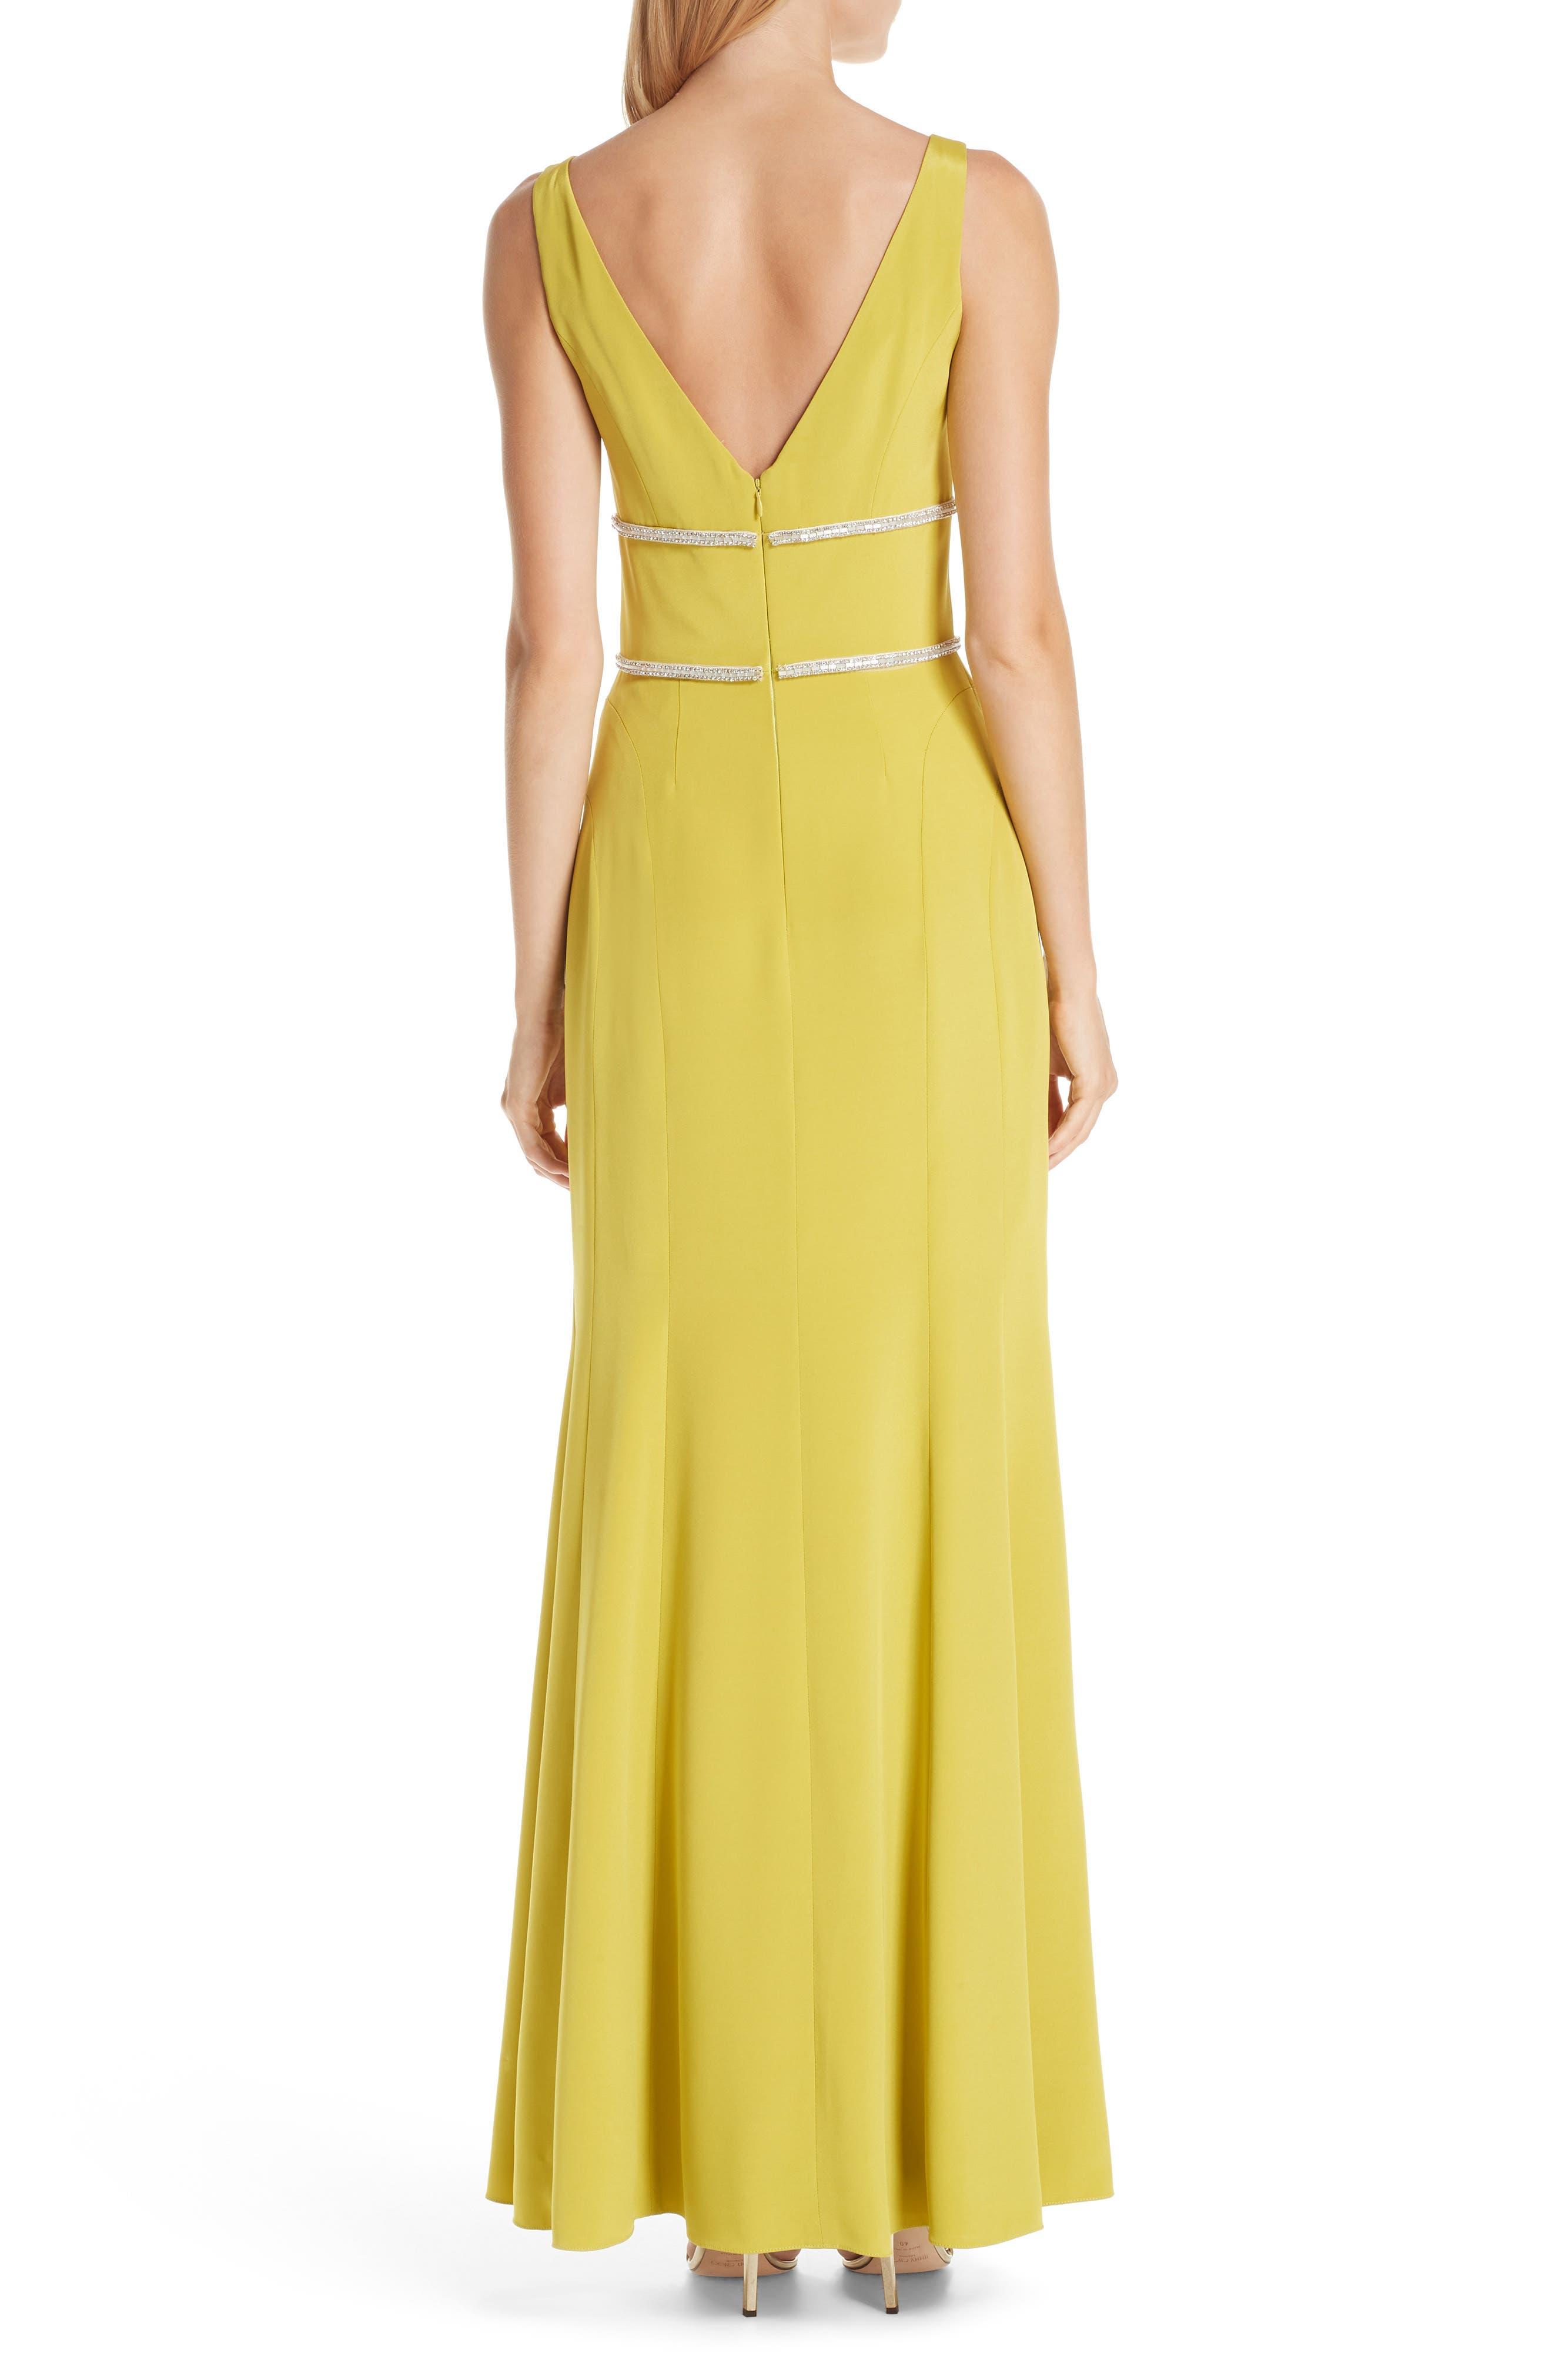 VERDIN,                             Embellished Silk V-Neck Evening Dress,                             Alternate thumbnail 2, color,                             CITRUS